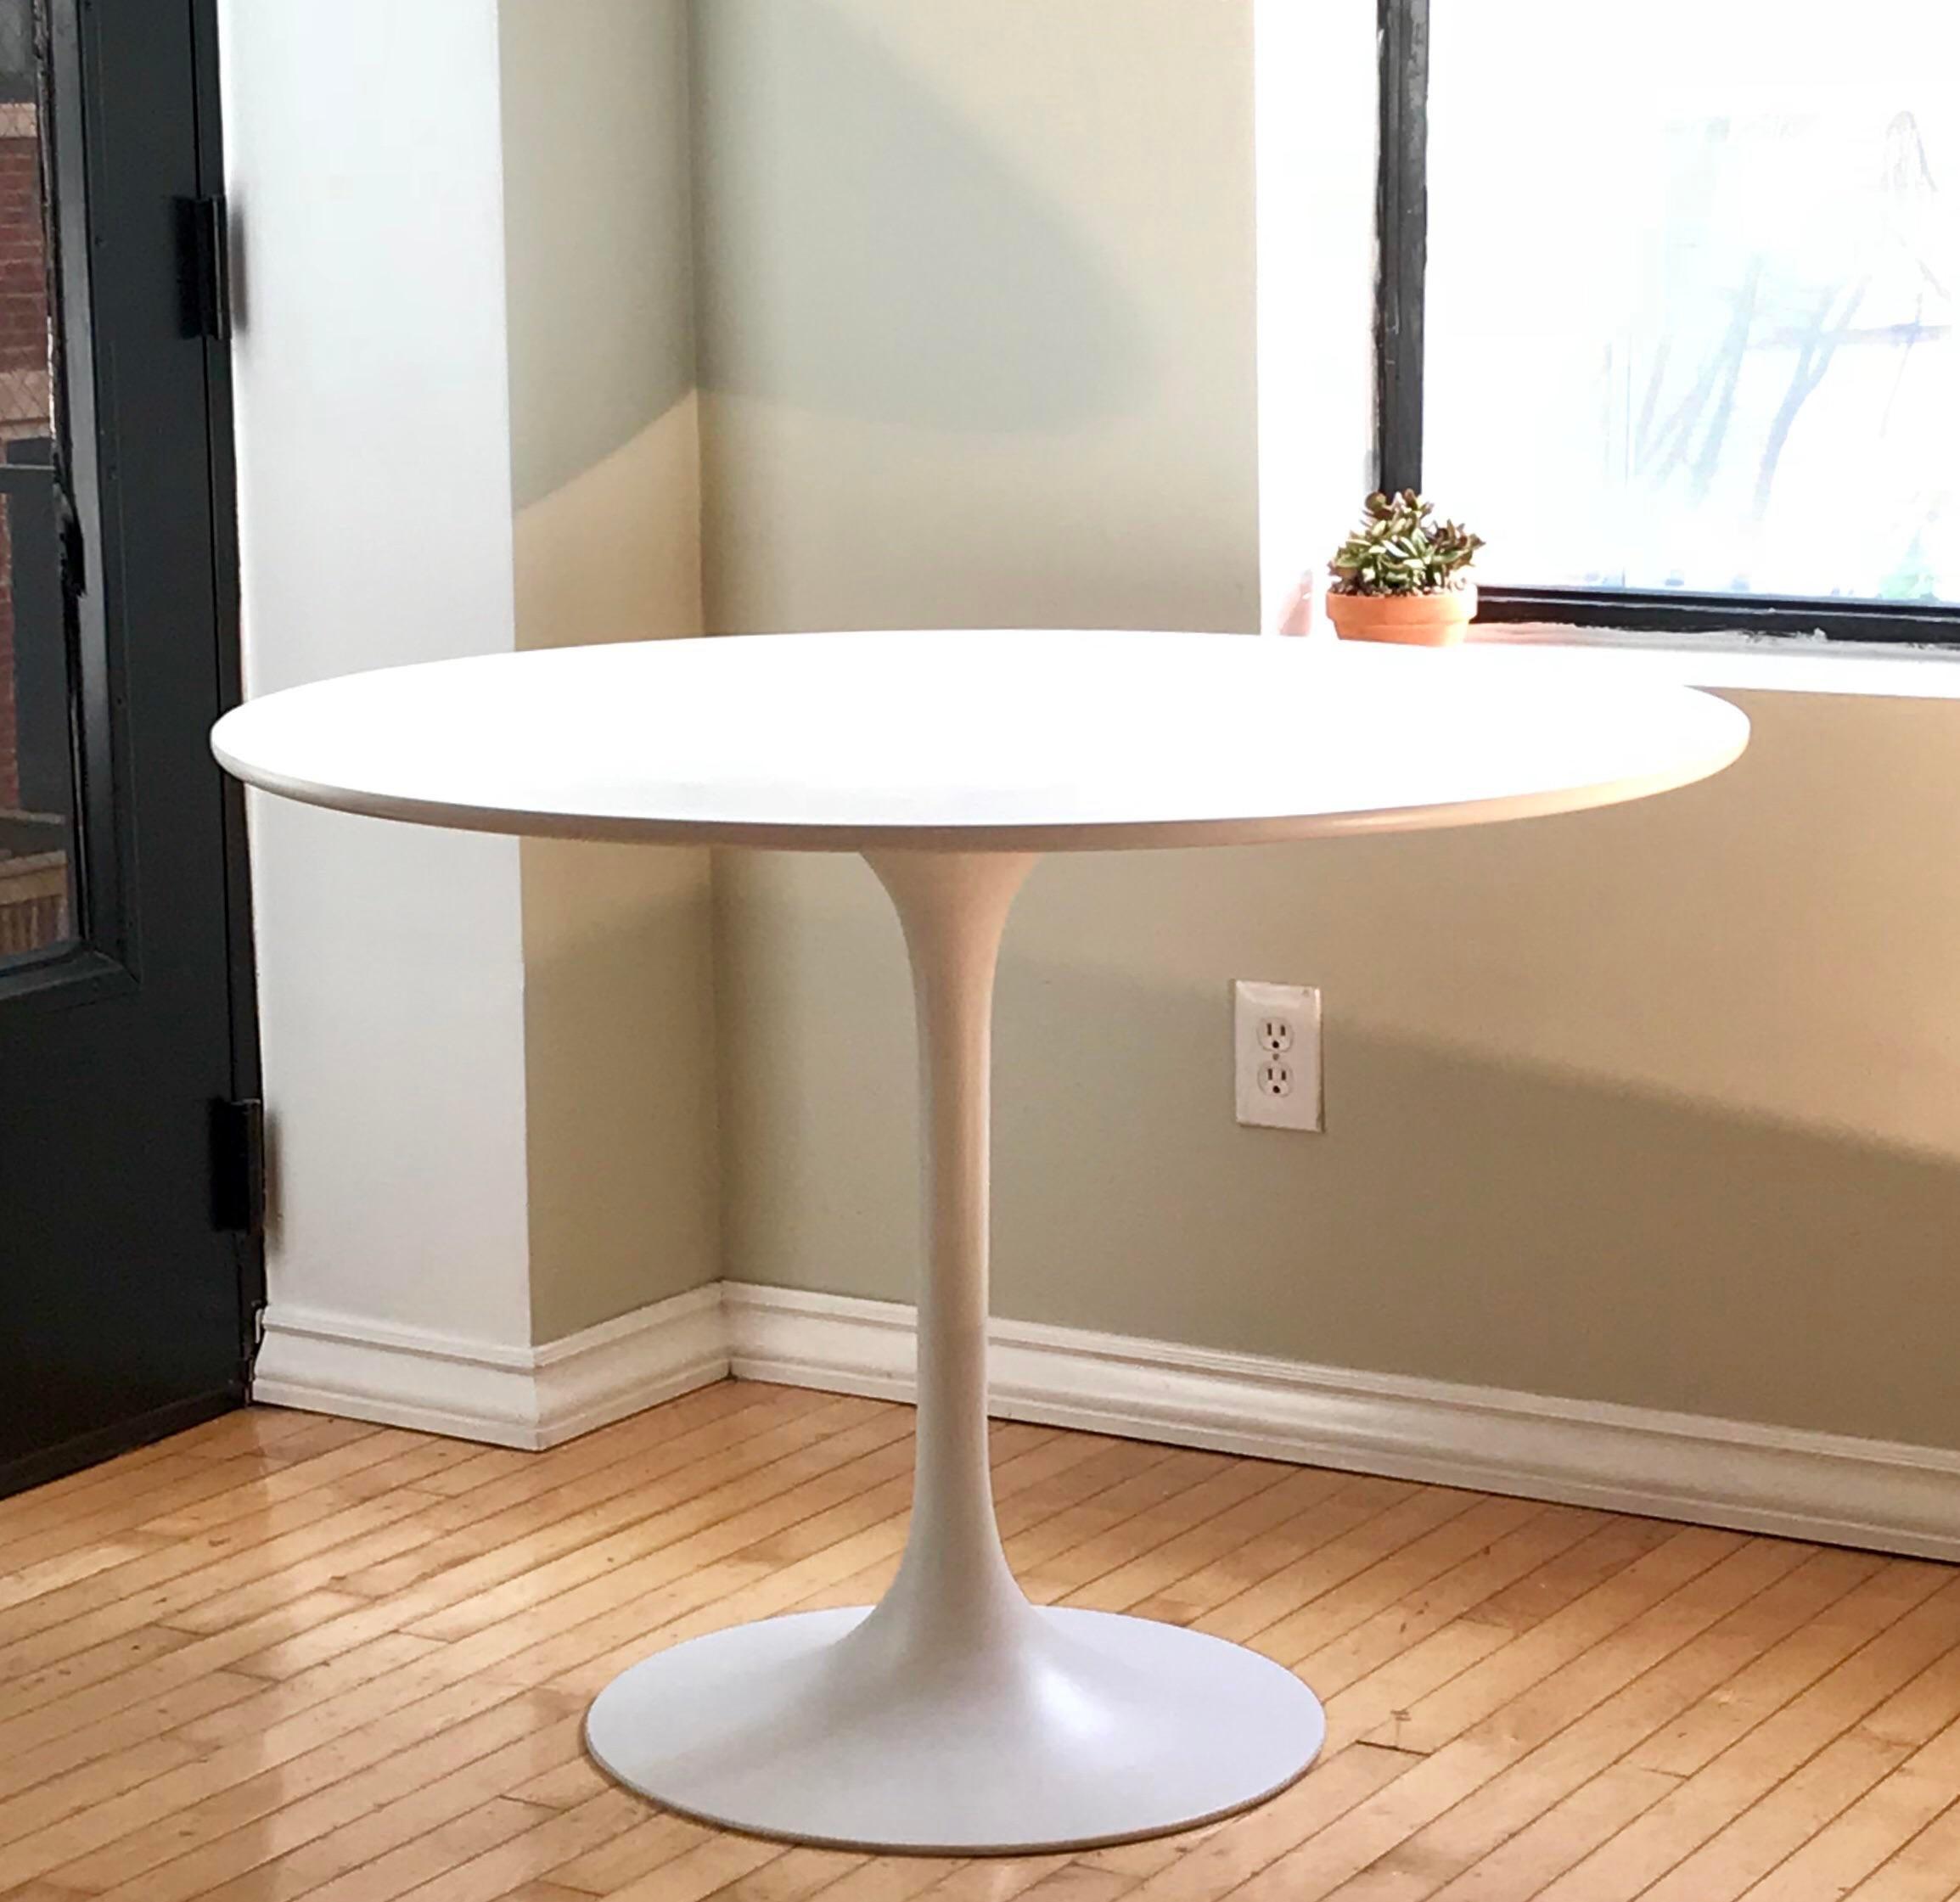 Superbe Mid Century Burke Tulip Table For Sale In Cincinnati   Image 6 Of 6